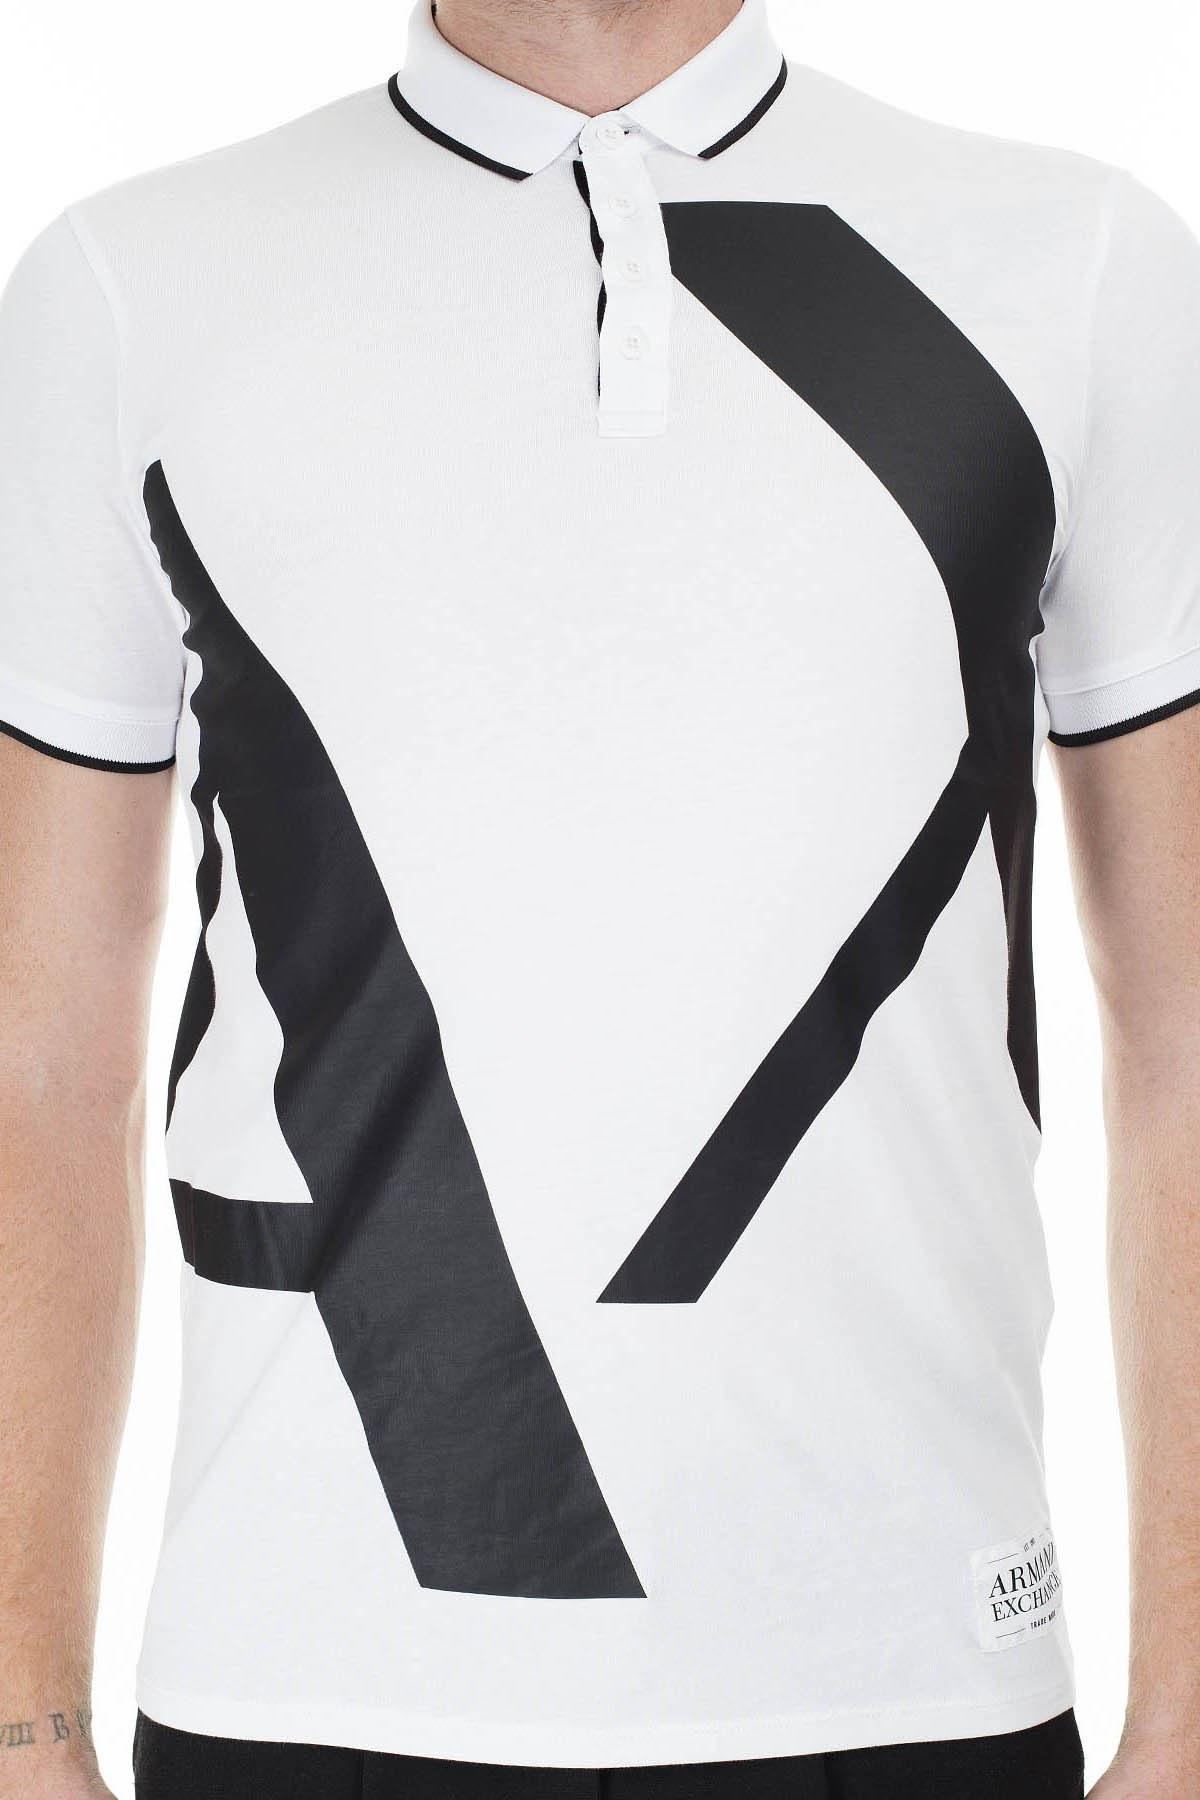 Armani Exchange Slim Fit Baskılı T Shirt Erkek Polo 3HZFFB ZJH4Z 7127 BEYAZ